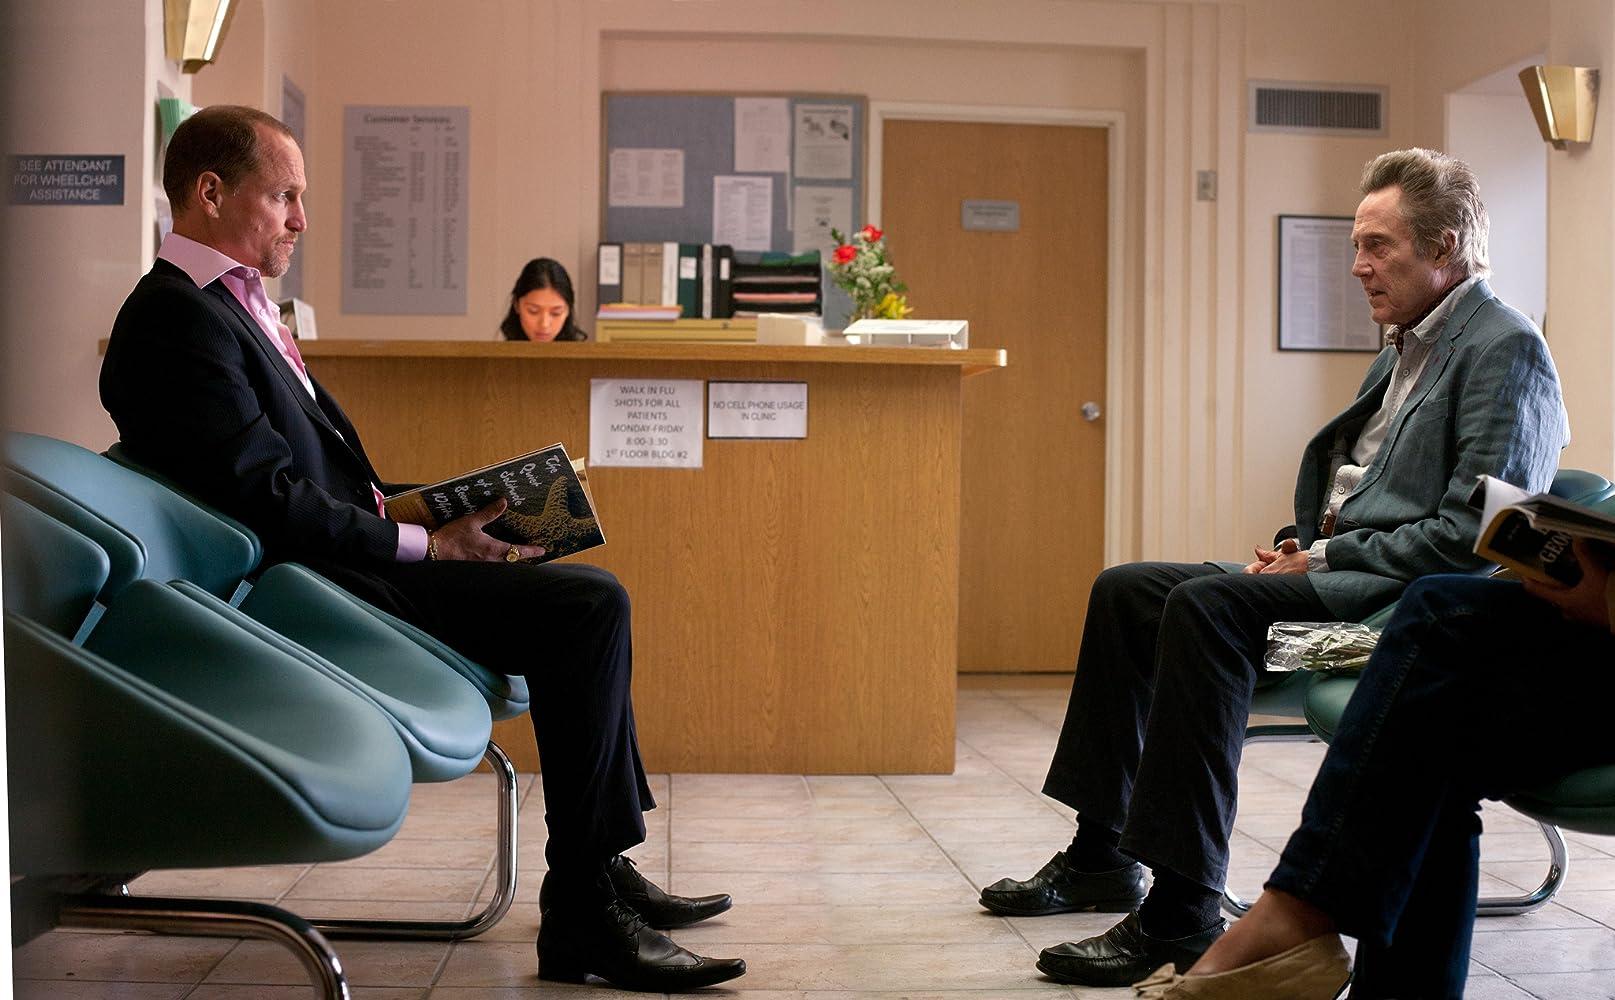 Woody Harrelson and Christopher Walken in Seven Psychopaths (2012)